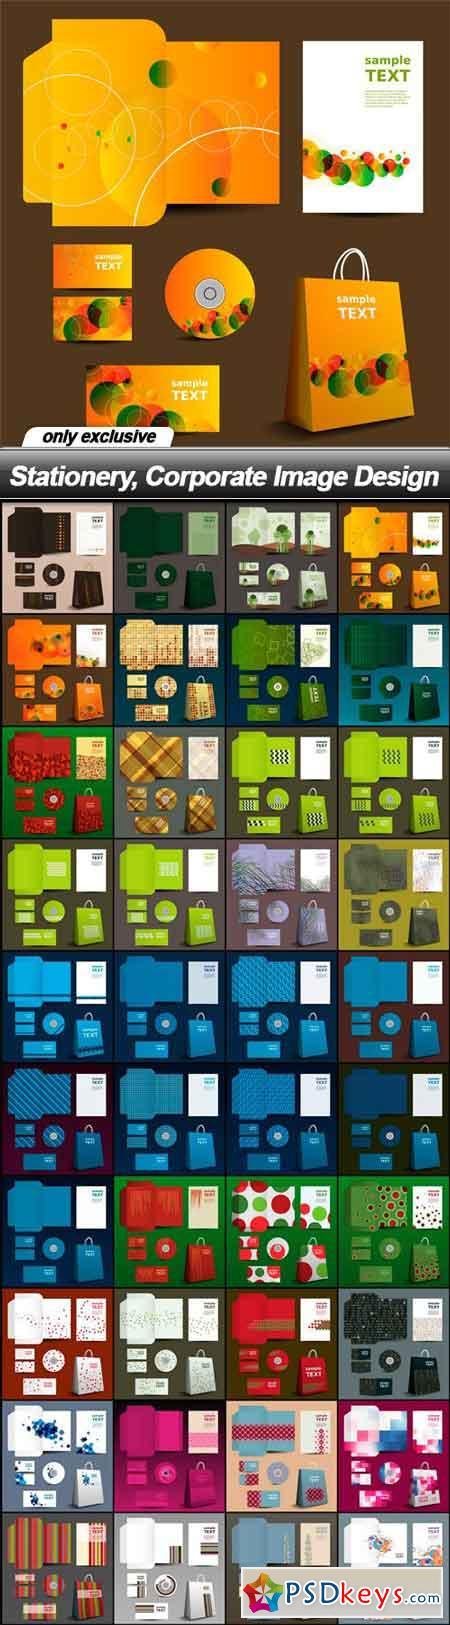 Stationery, Corporate Image Design - 40 EPS